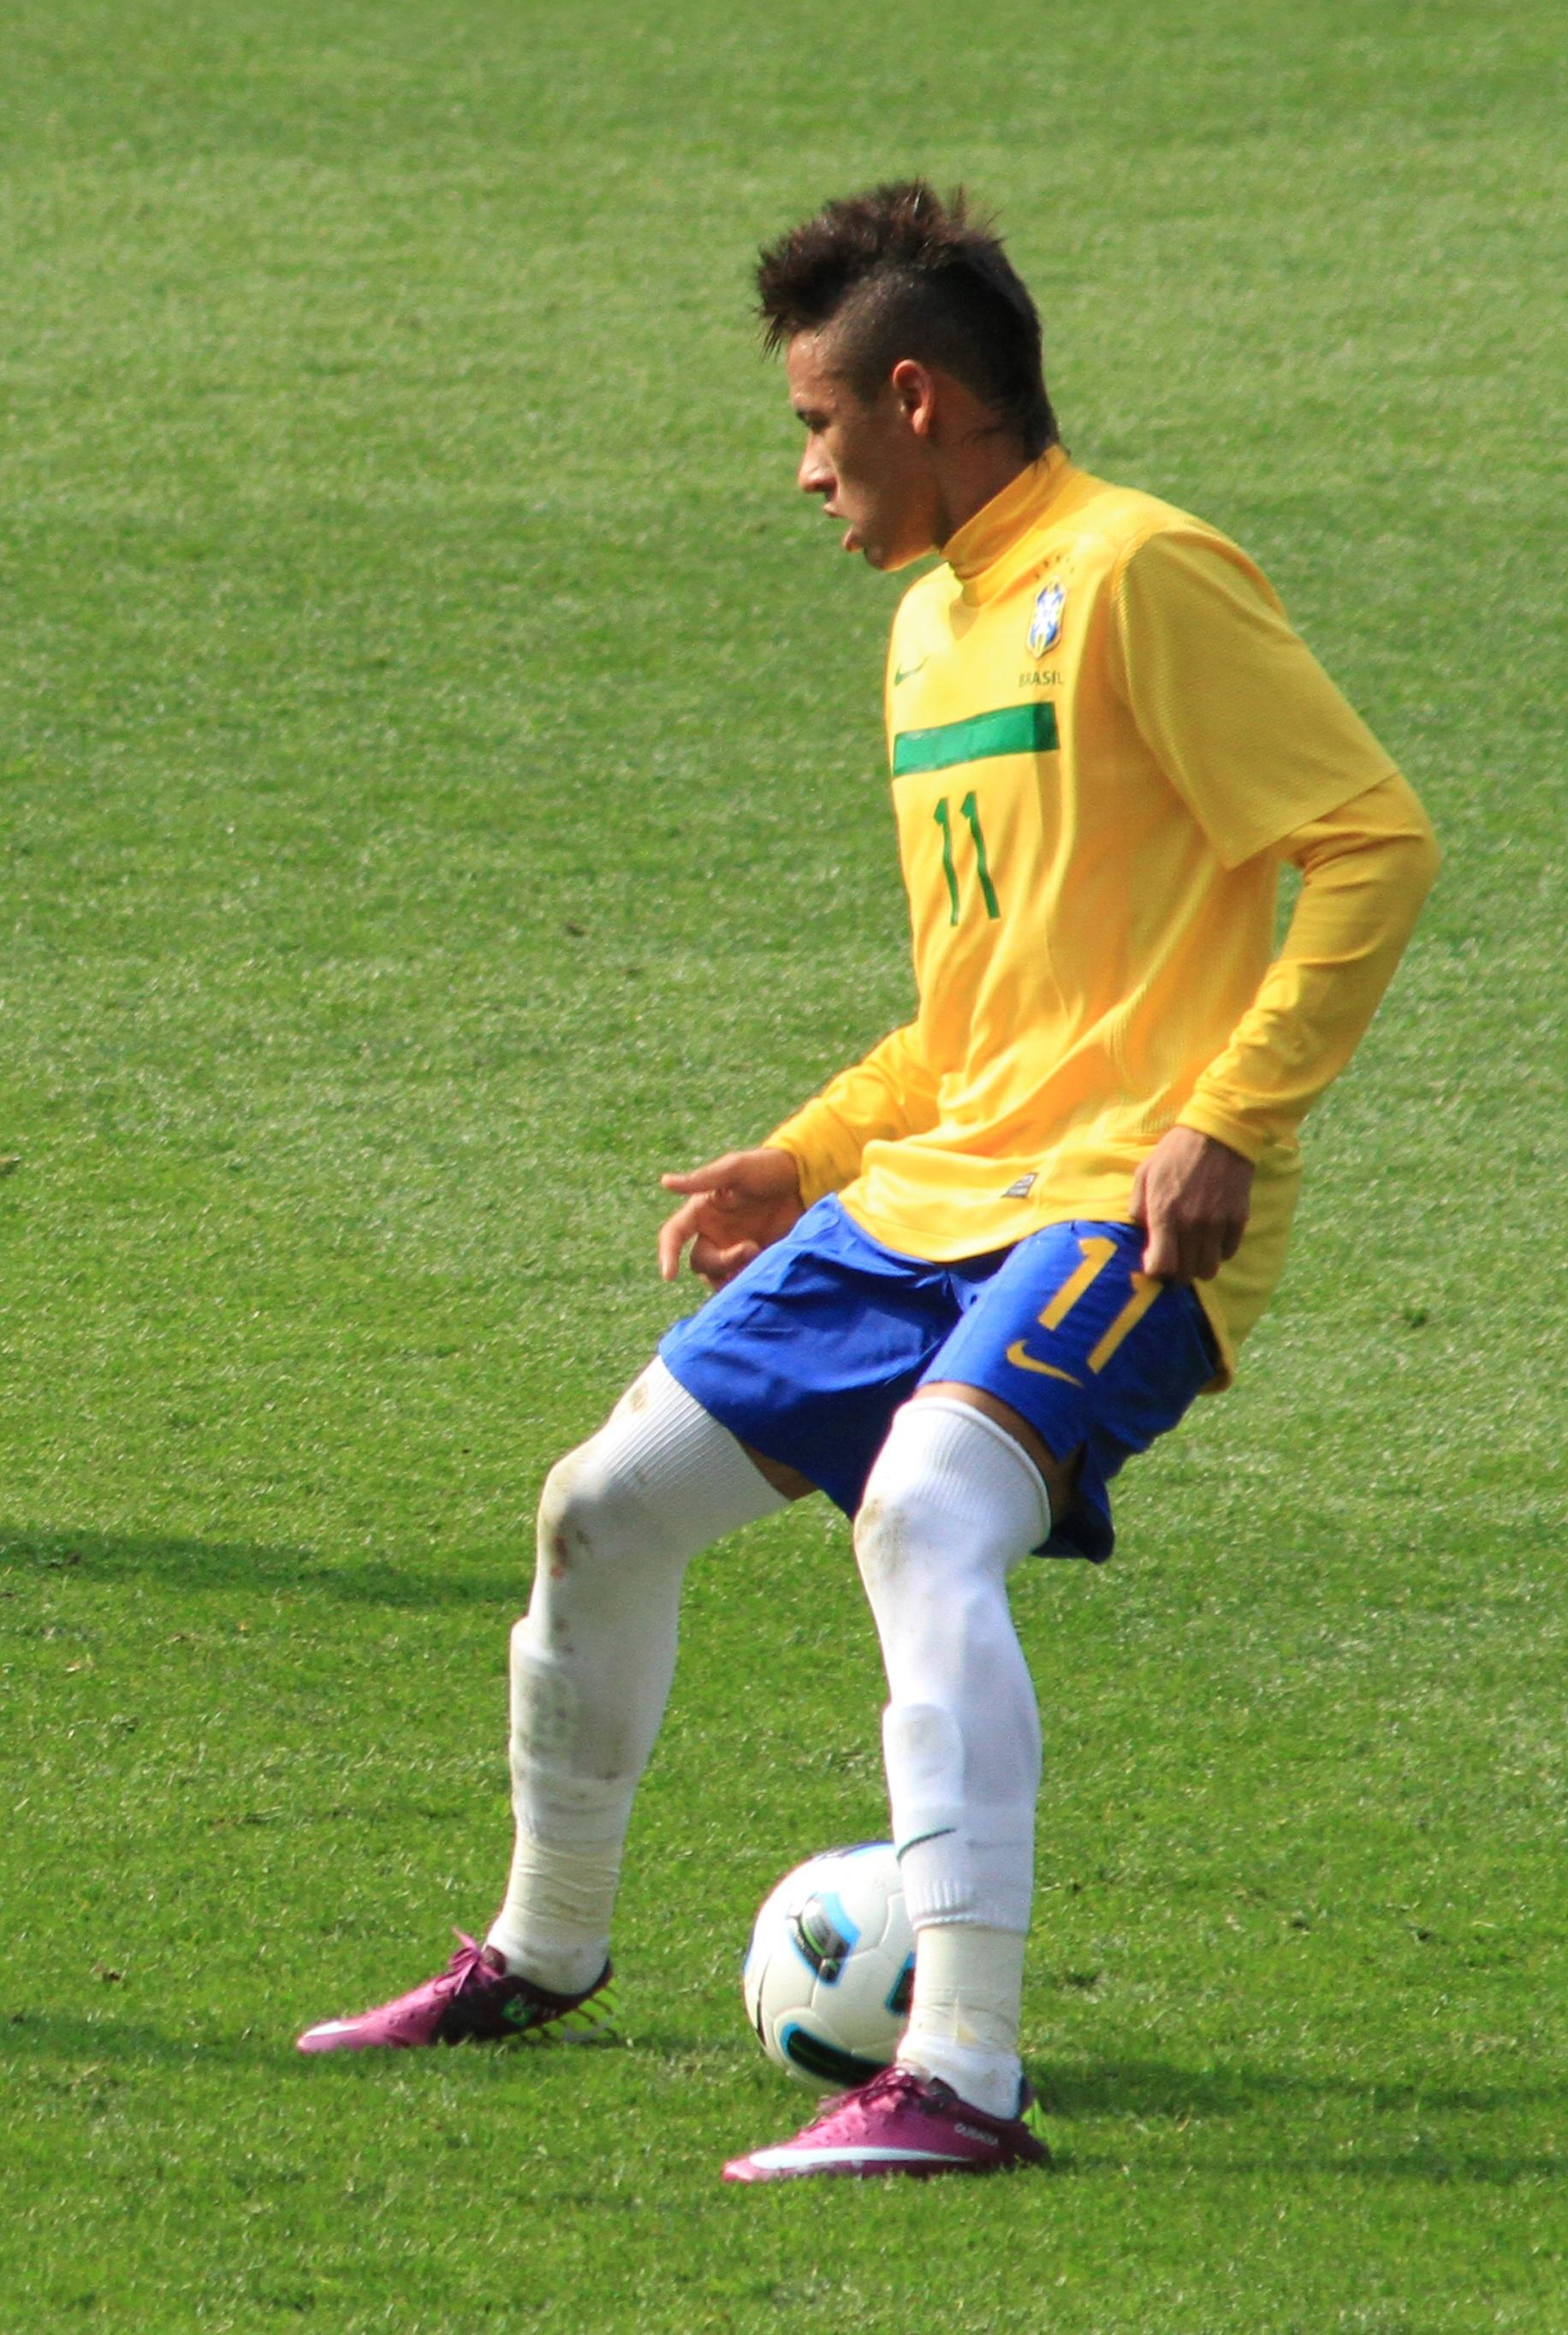 Neymar? C. Ronaldo? Messi? Entrá y elegí!